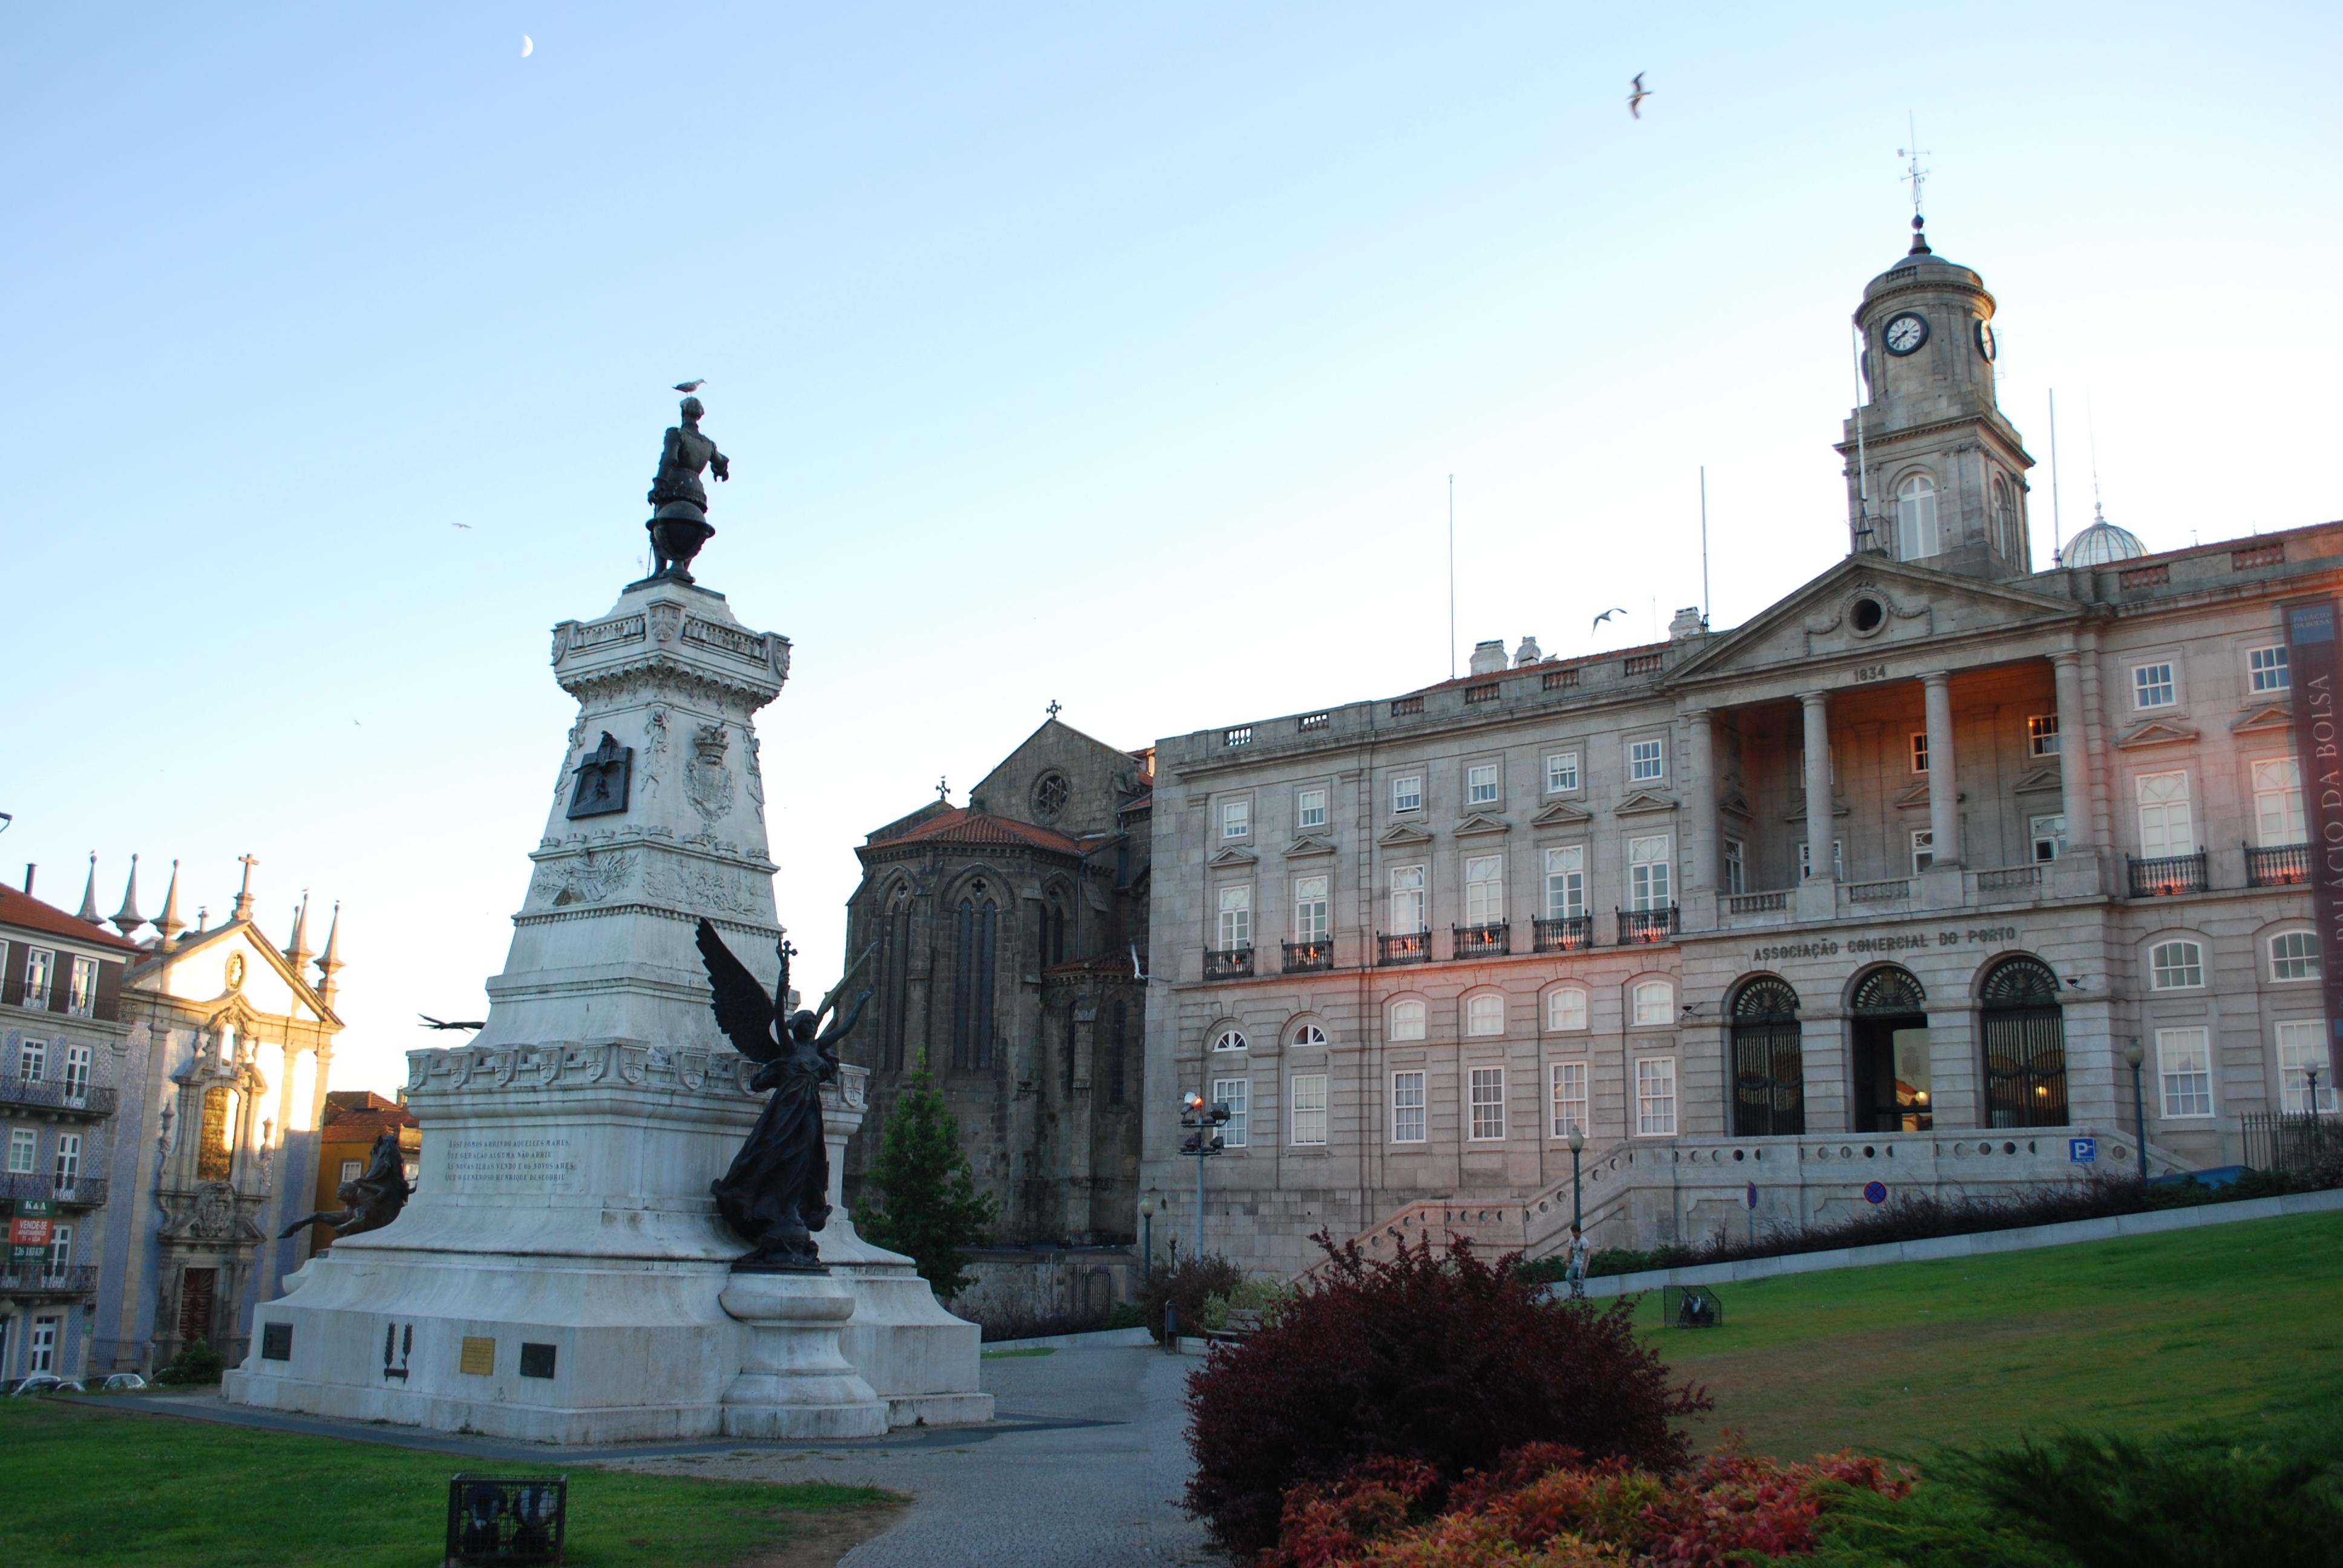 Palácio da Bolsa - fachada